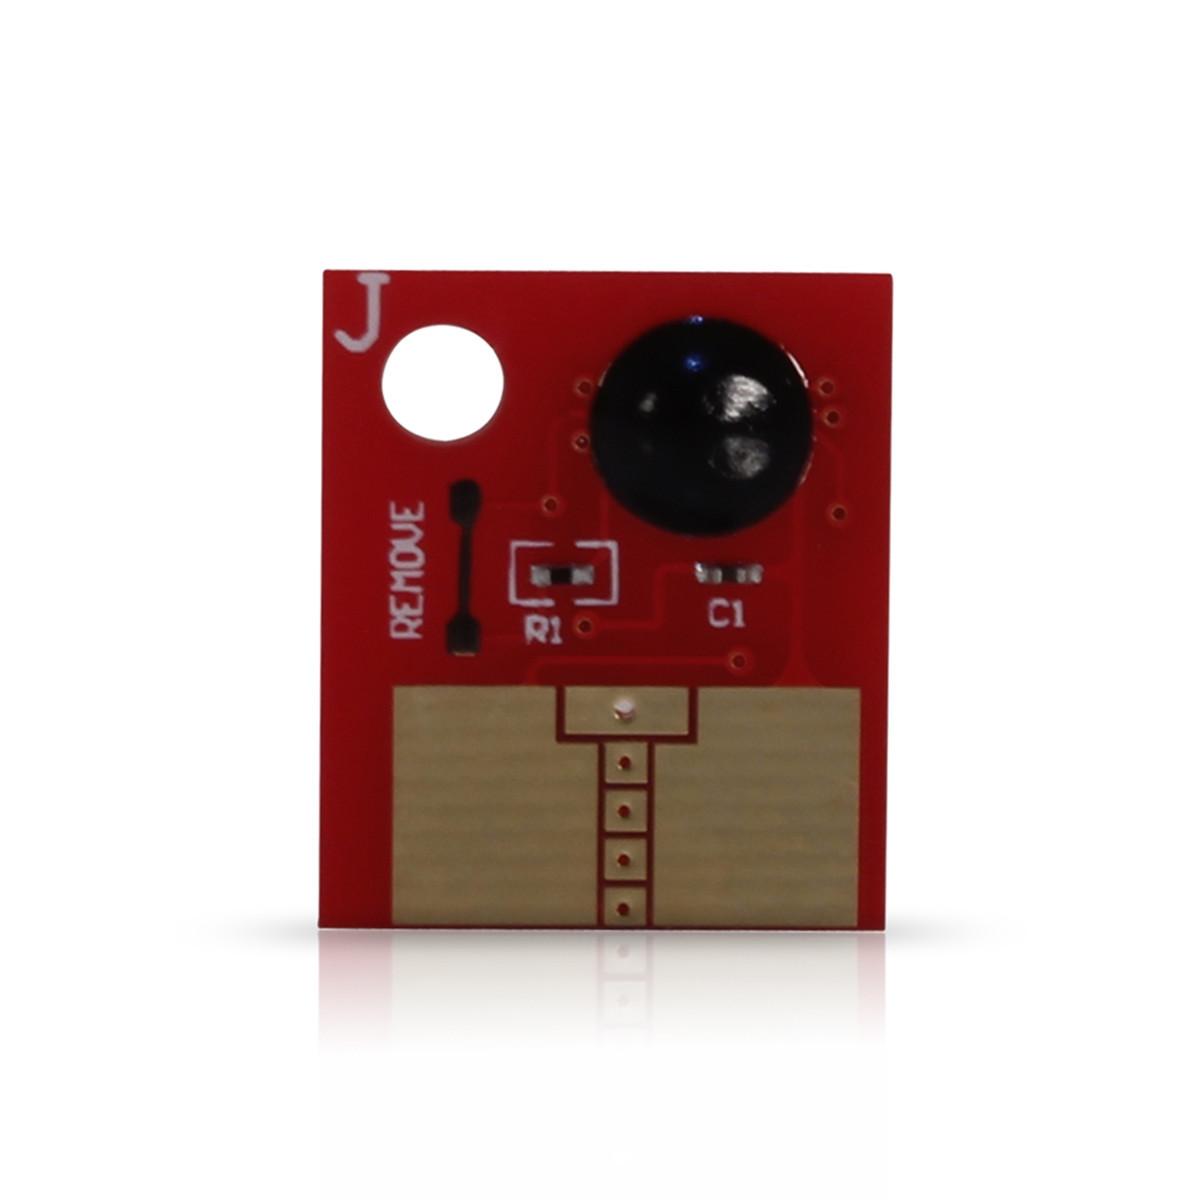 Chip para Lexmark E230 E232 E240 E330 E332 E340 E342 E342N | Toner 24038SL | 6.000 páginas